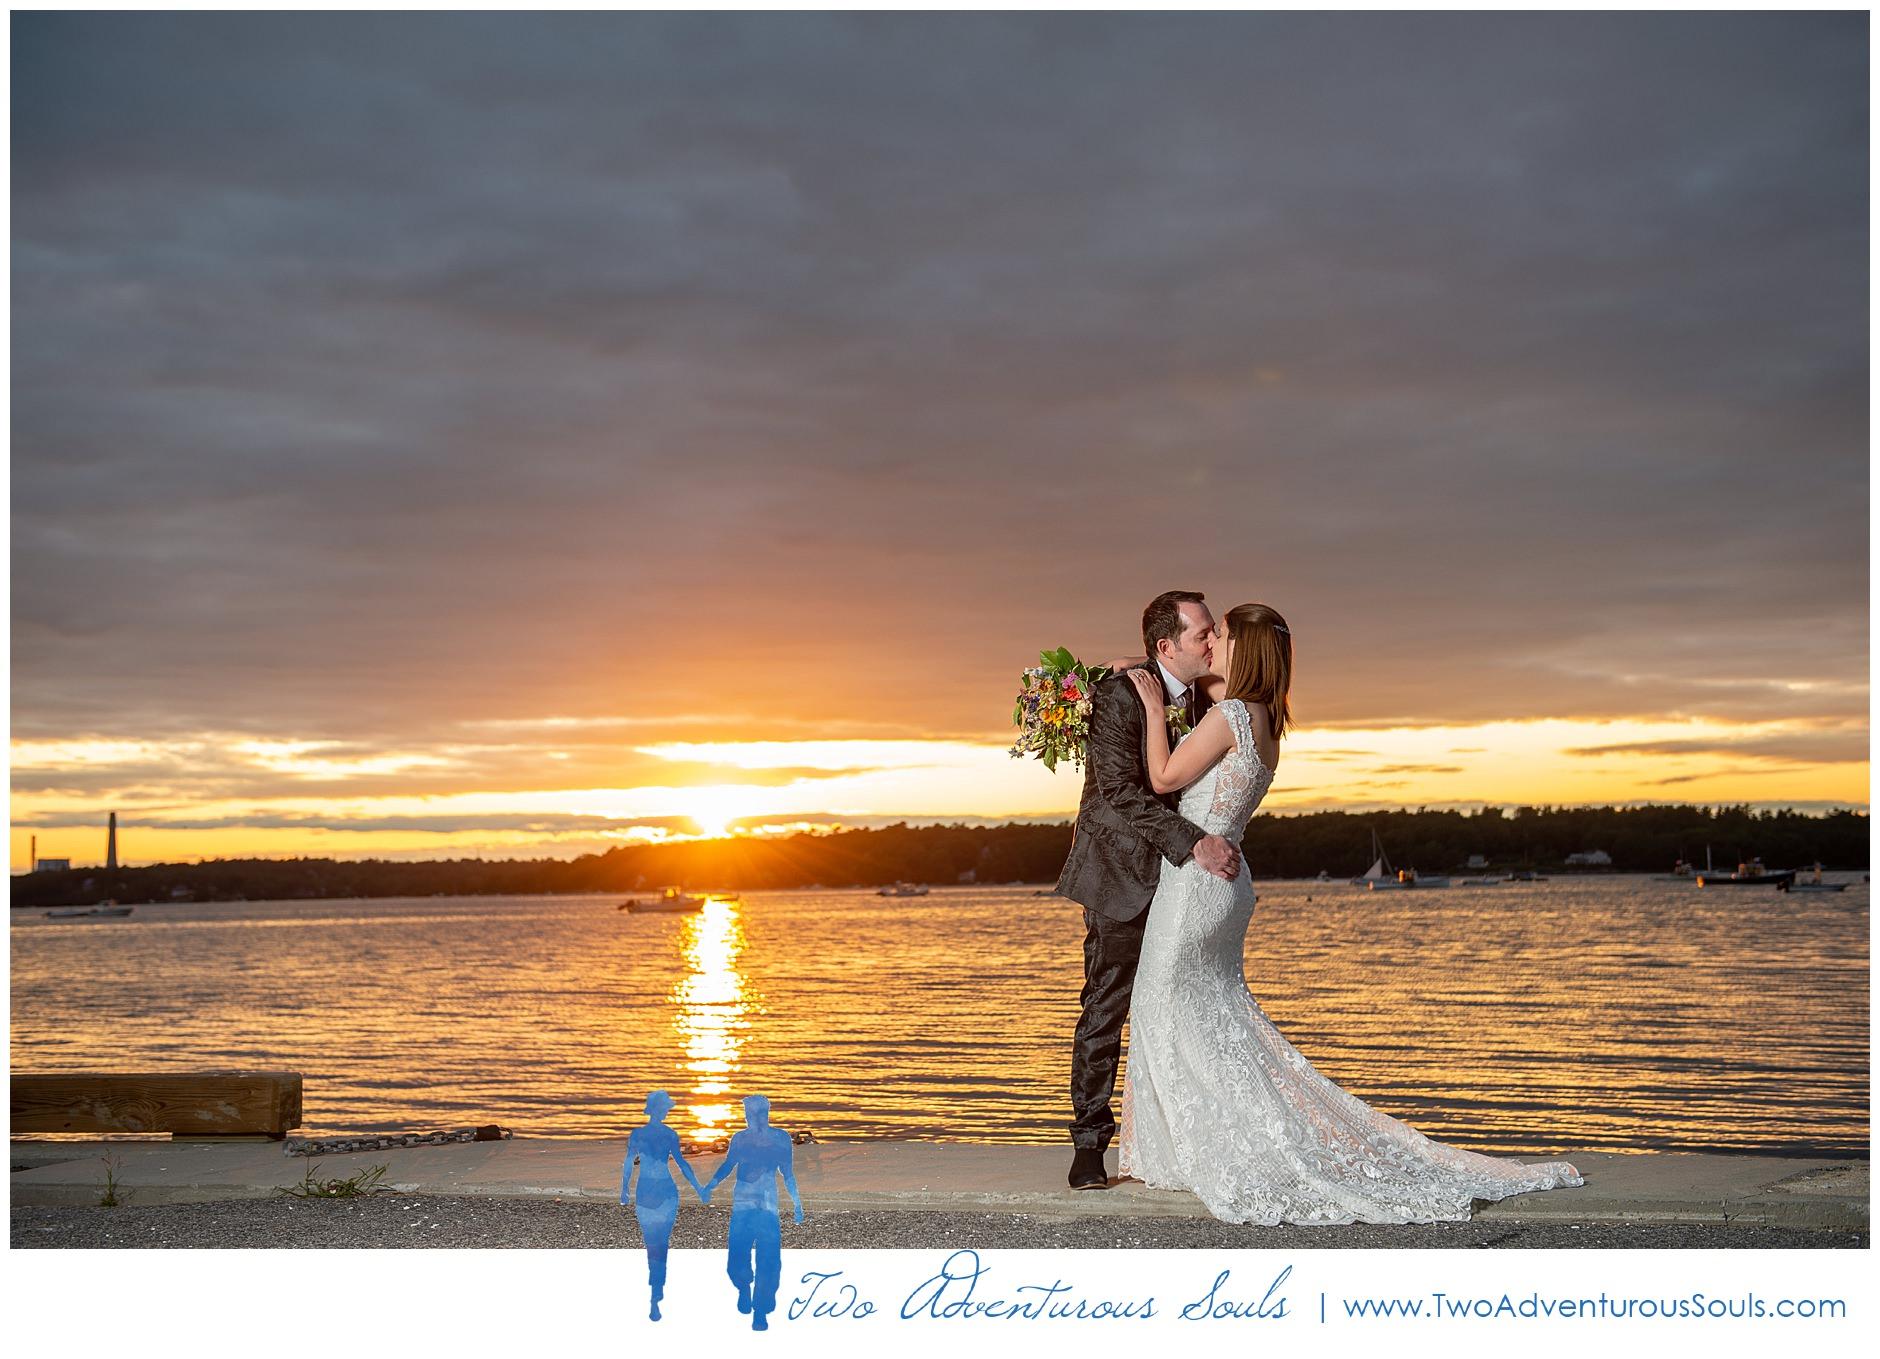 Chebeague Island Inn Wedding Photograpehrs, Maine Wedding Photographers, Two Adventurous Souls-082419_0020.jpg